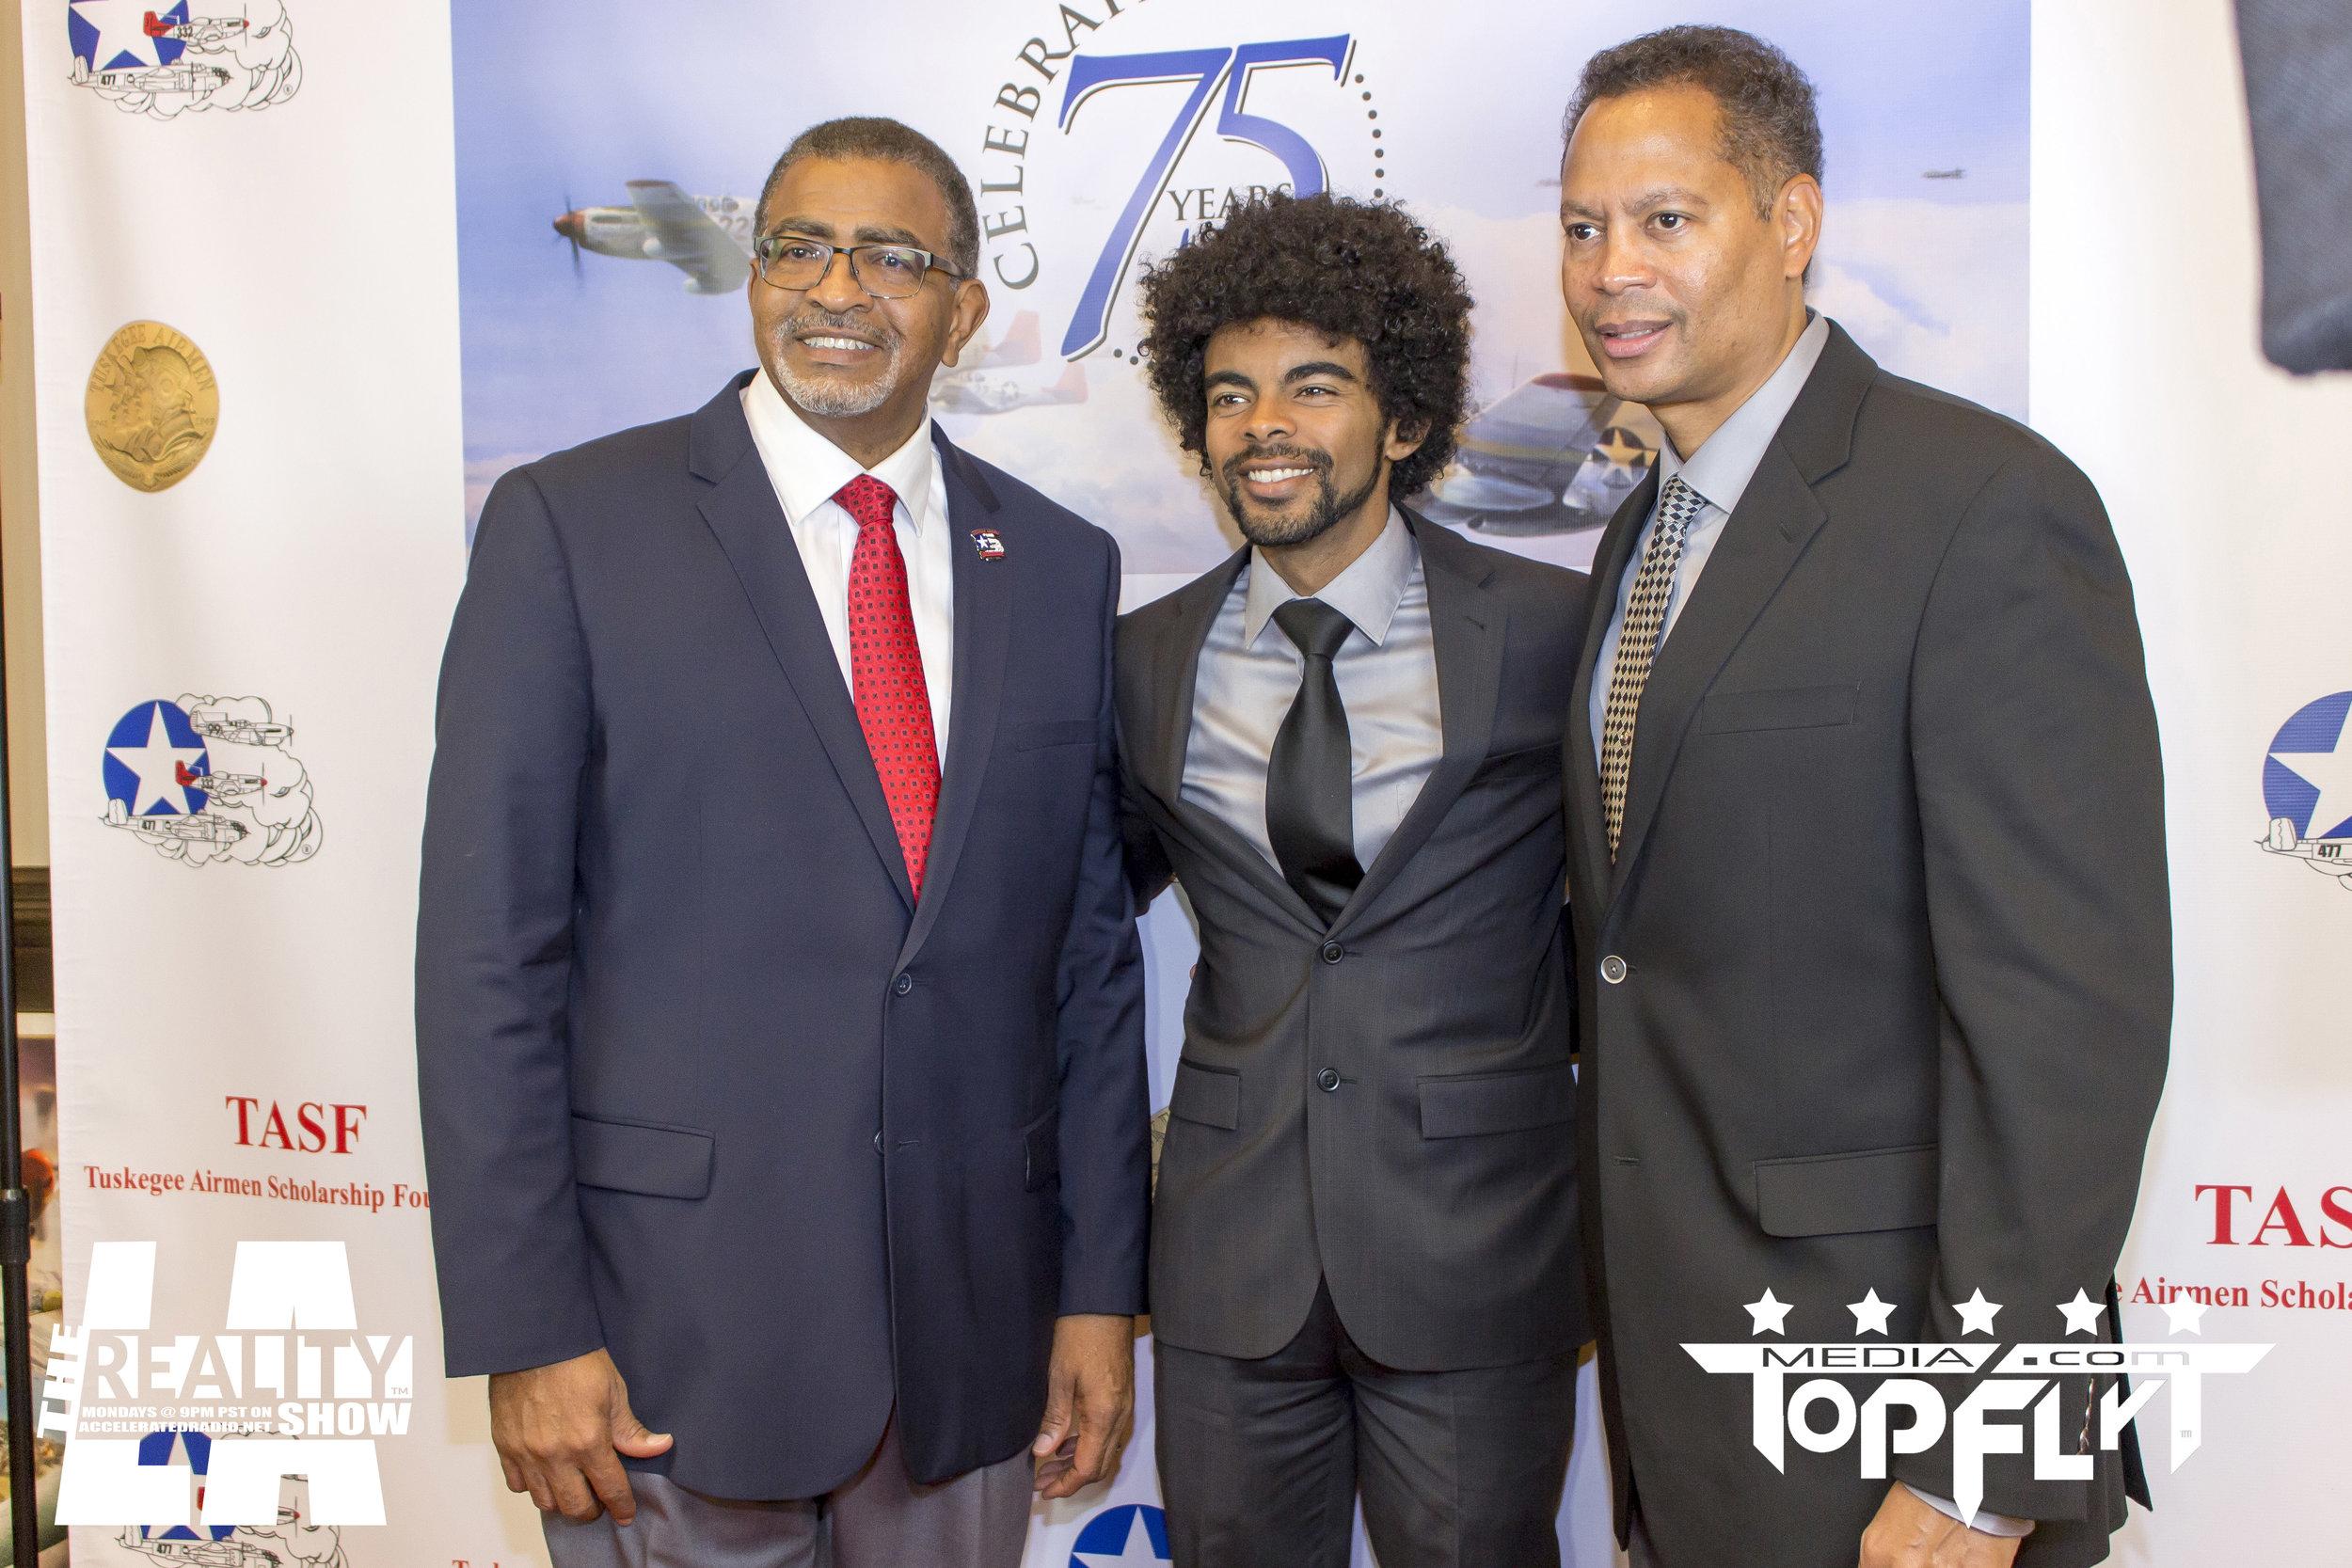 The Reality Show LA - Tuskegee Airmen 75th Anniversary VIP Reception_104.jpg